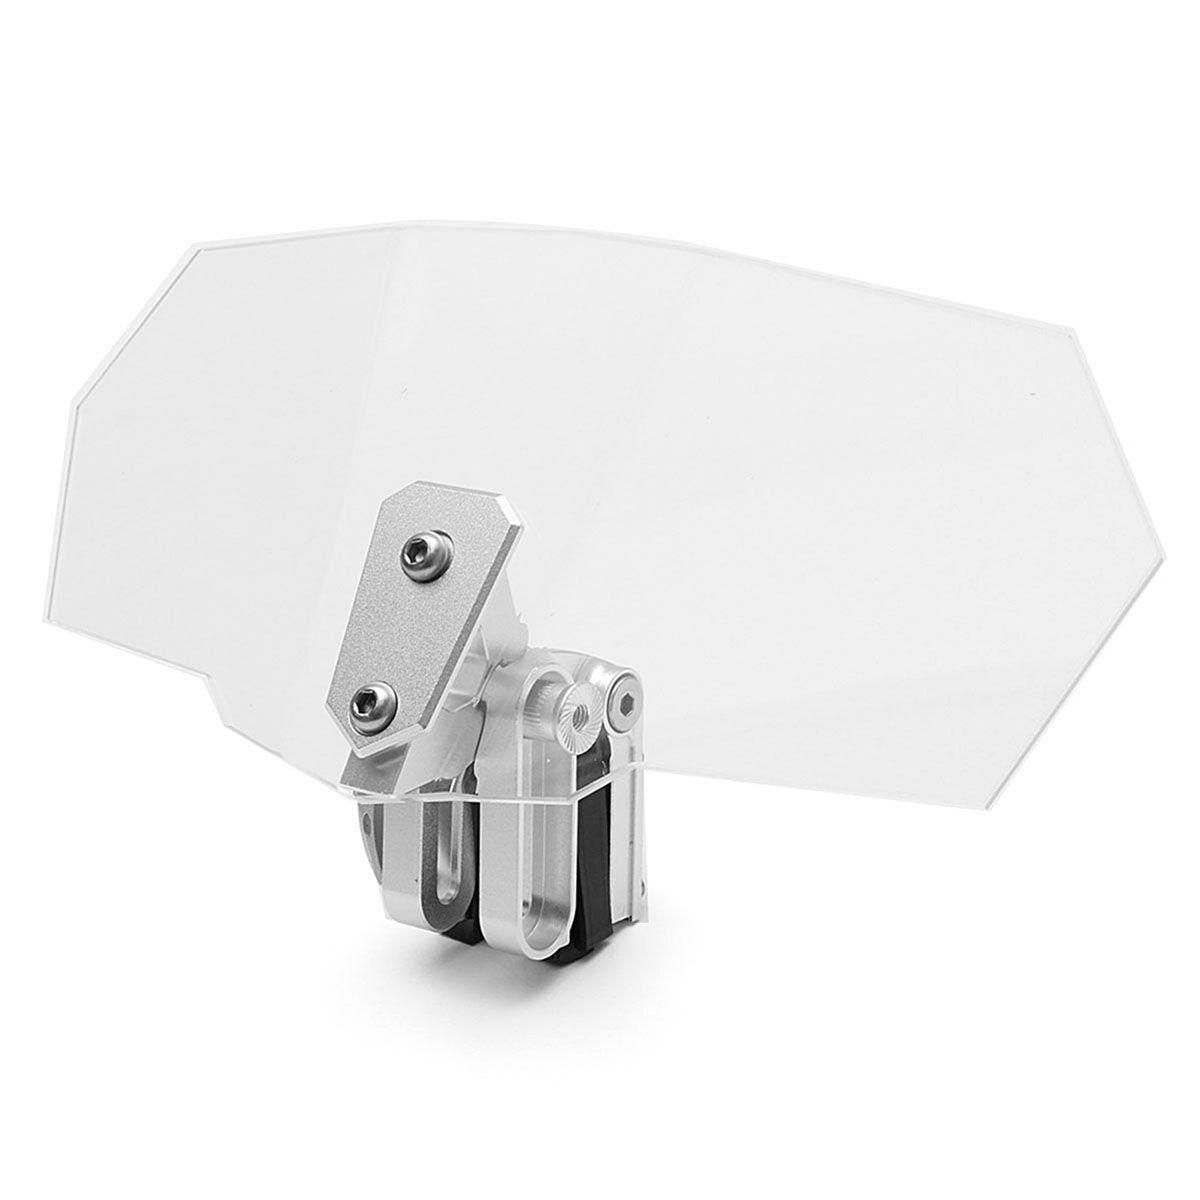 Unversal Aluminum Motorcycle Adjustable Clip On Windshield Extension Spoiler Windscreen Screen Deflector Spoiler wind deflector